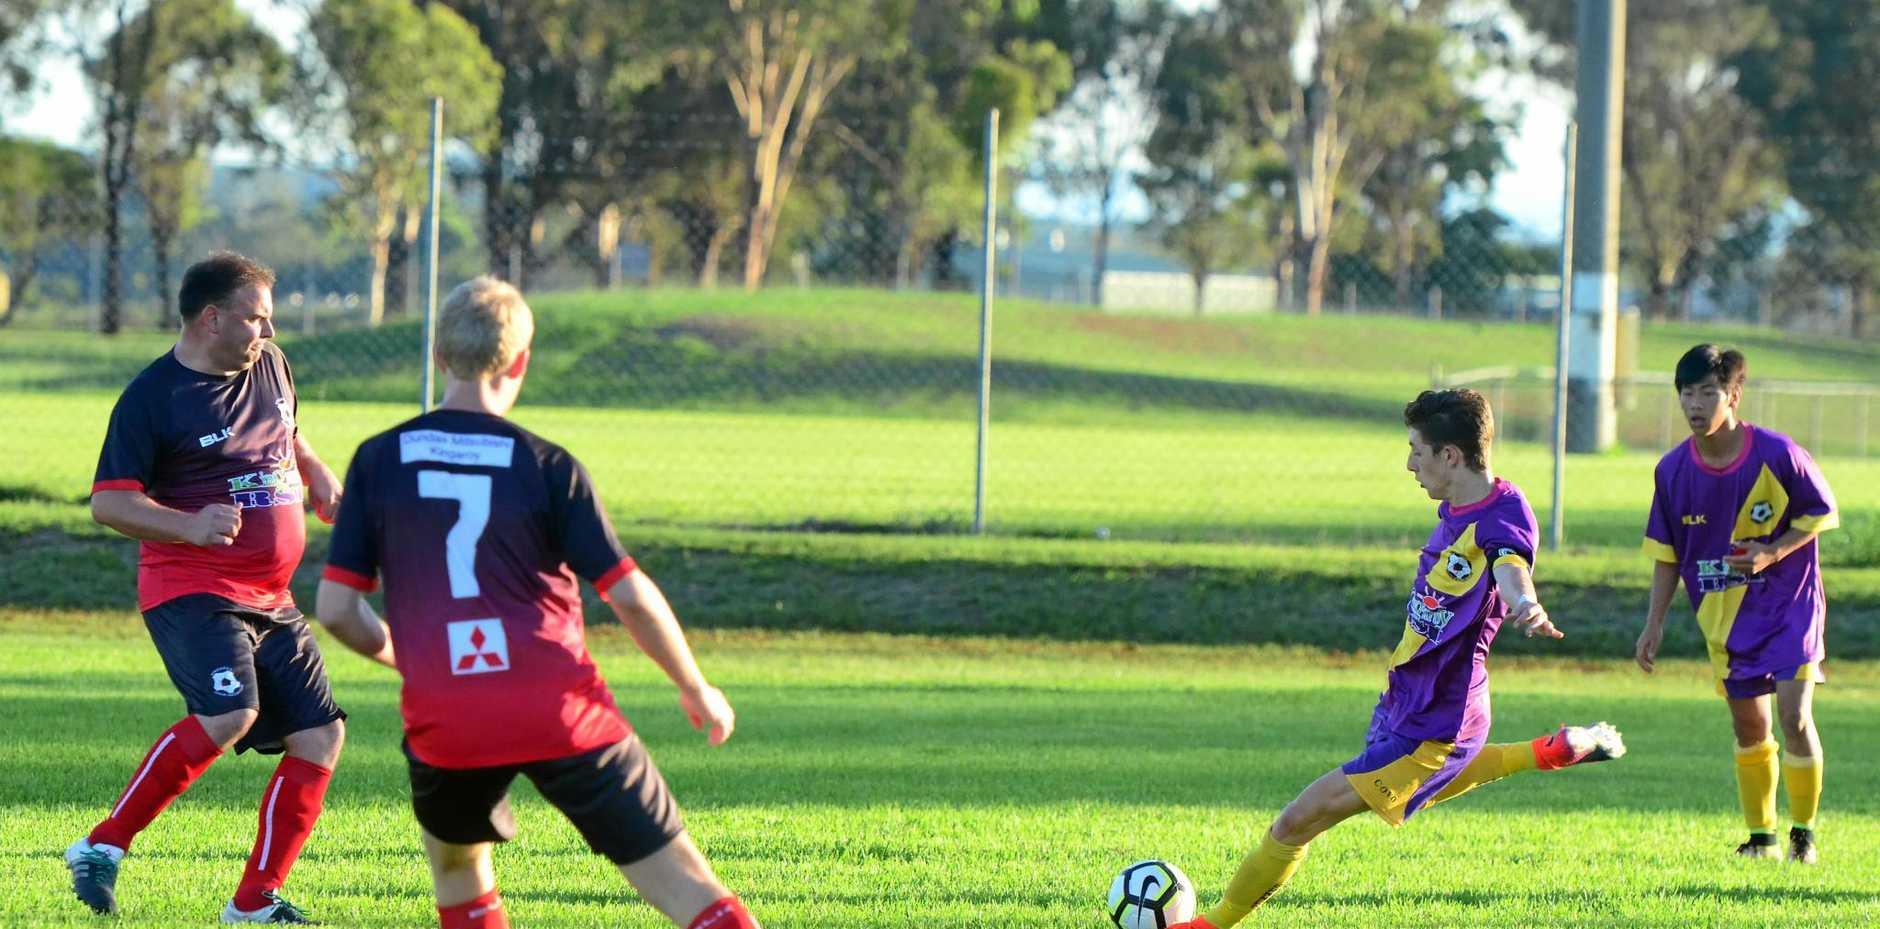 Joseph Copas launches a long ball for Gunners.